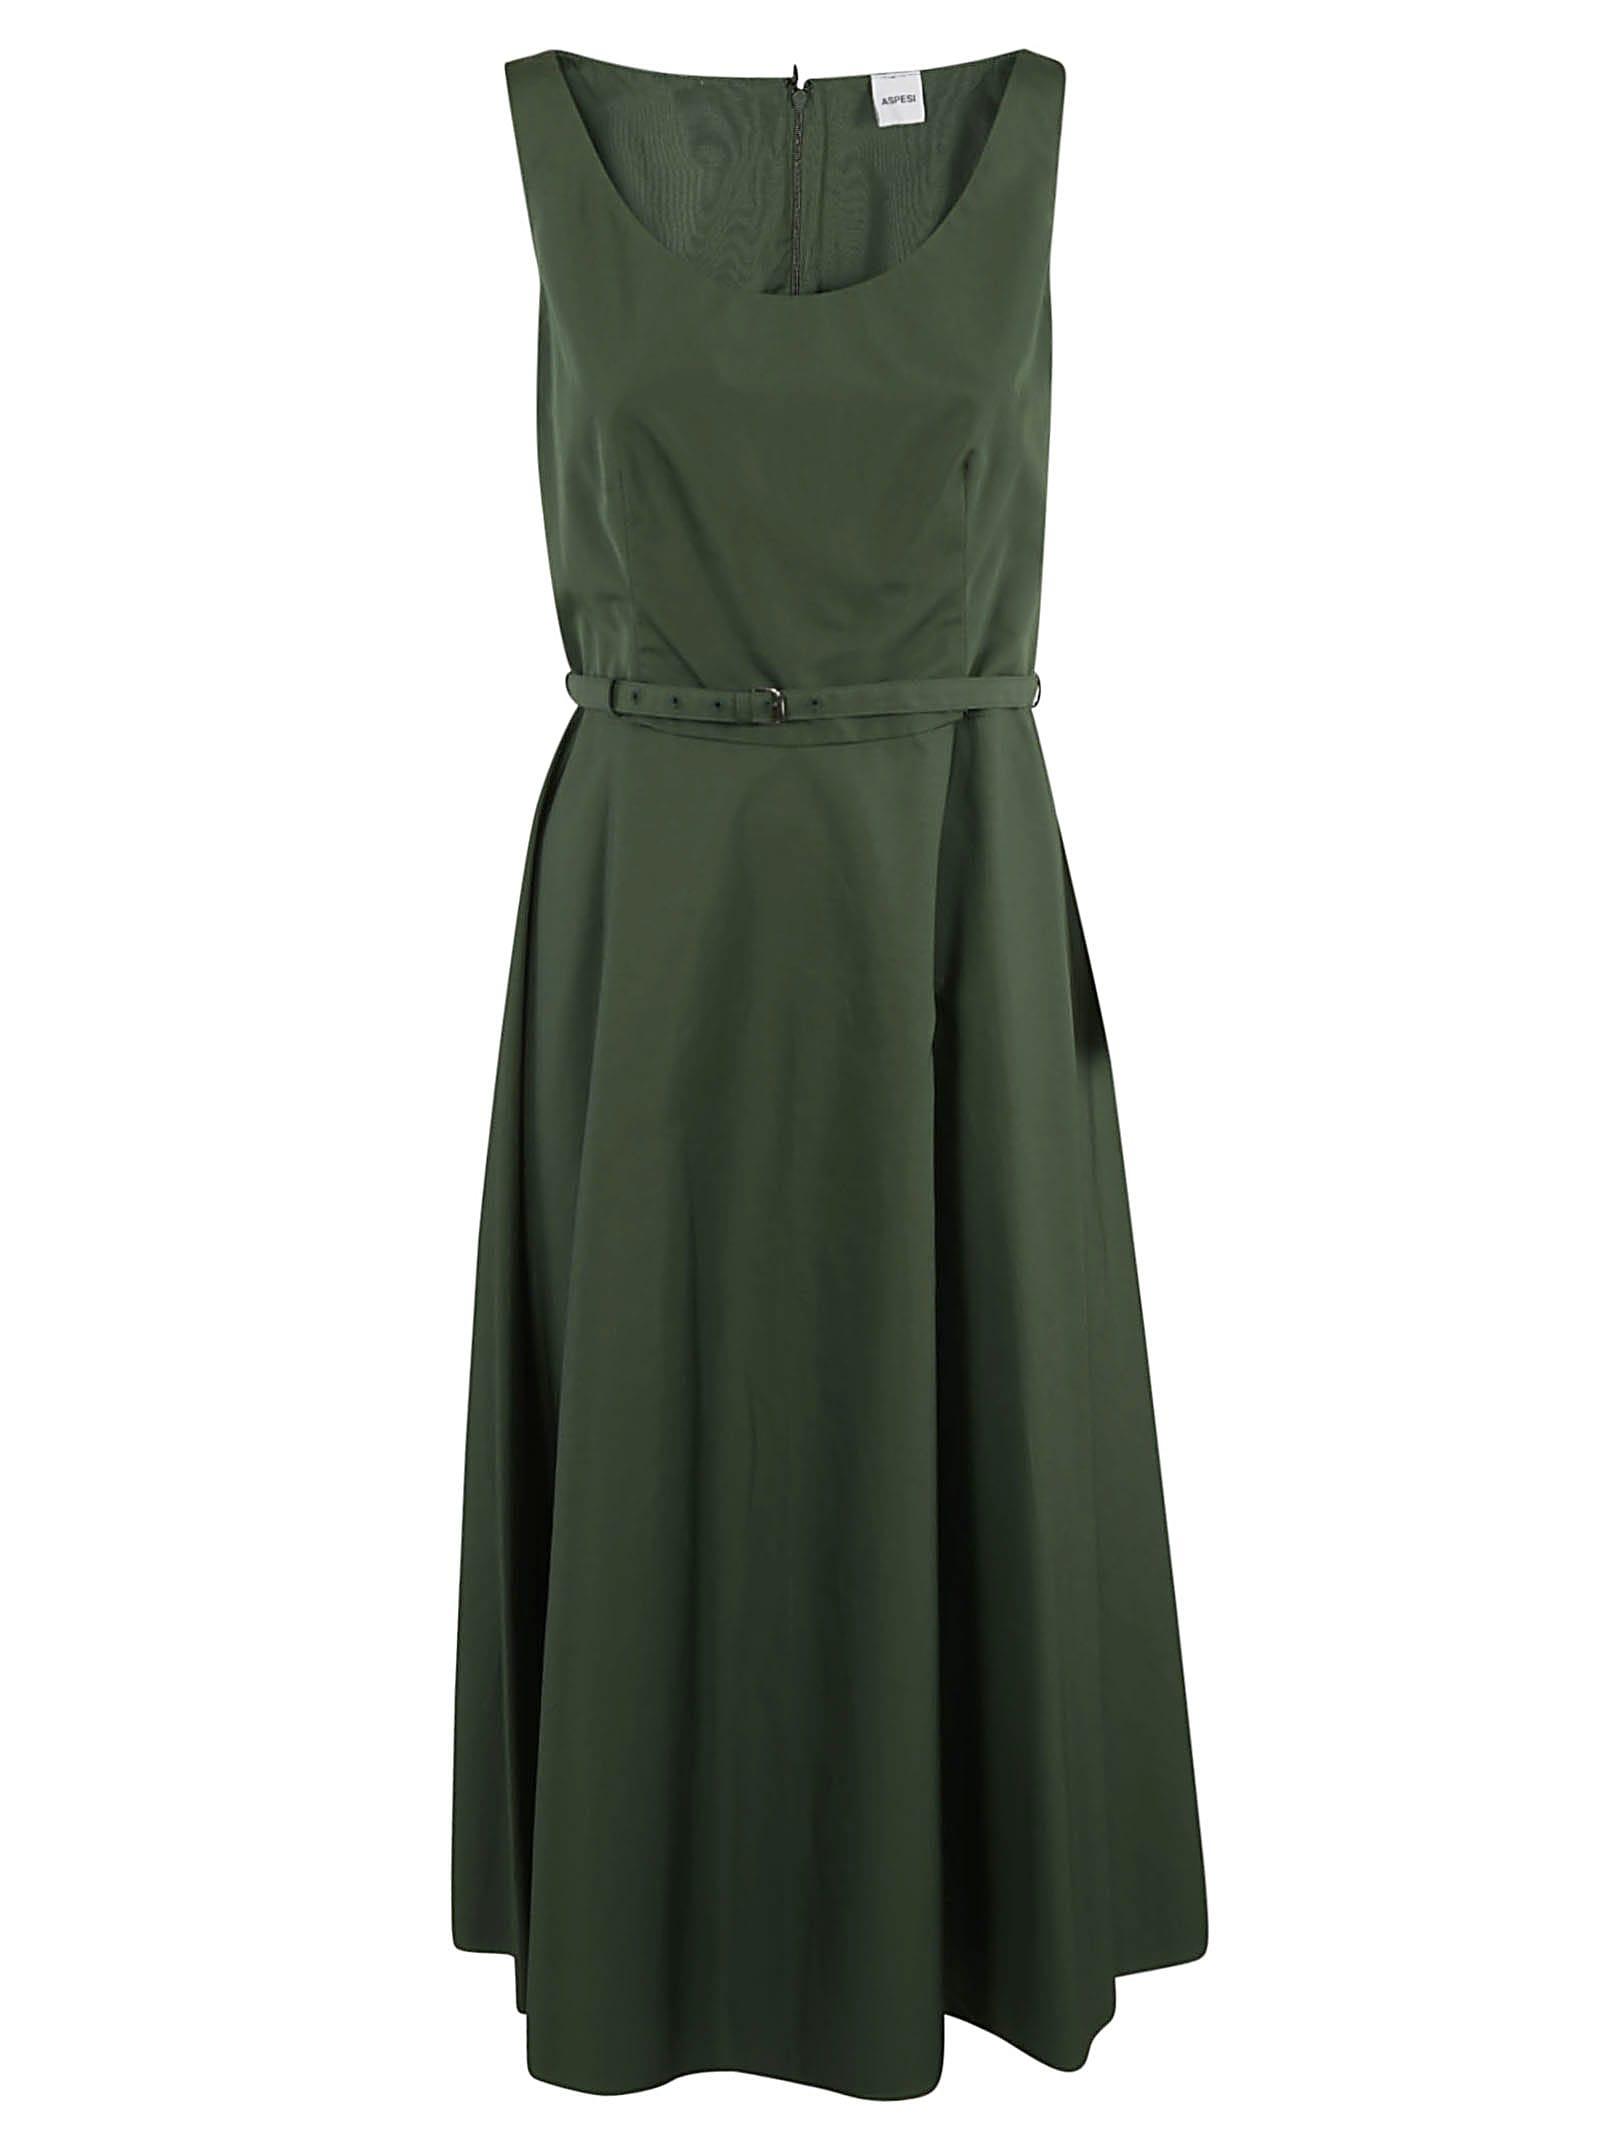 Buy Aspesi Belted Waist Sleeveless Dress online, shop Aspesi with free shipping